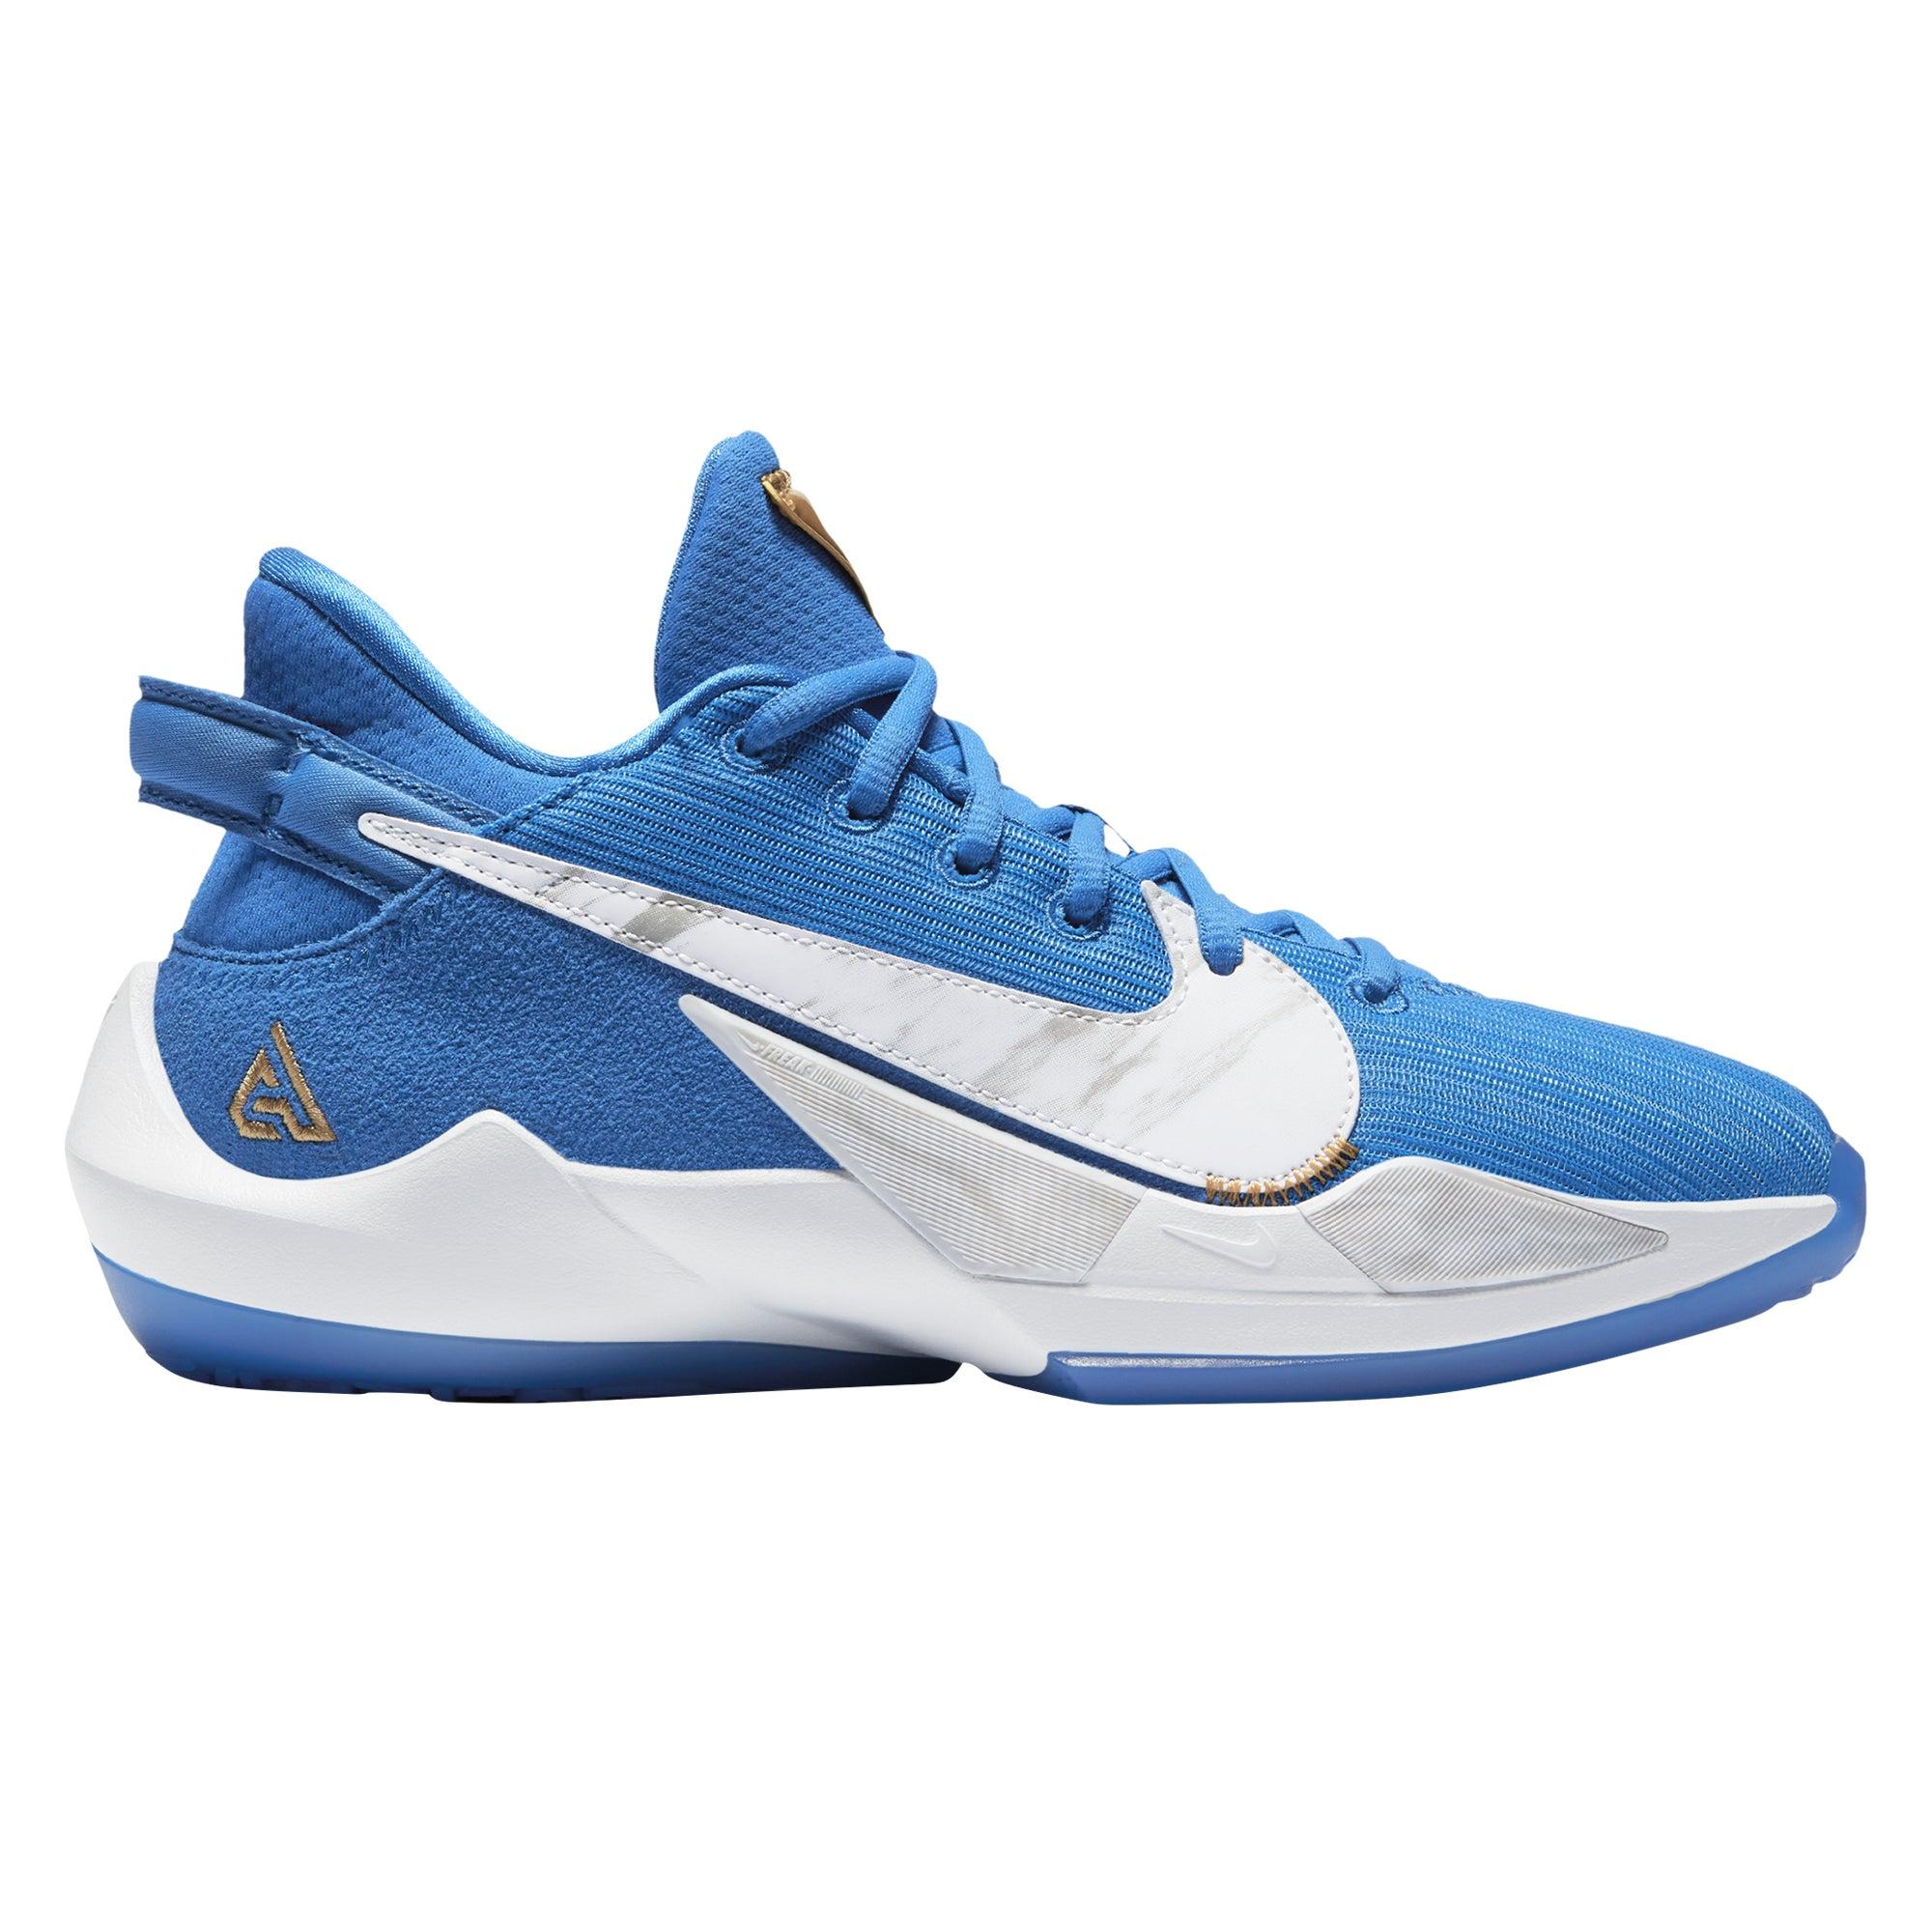 Nike Freak 2 Shoes